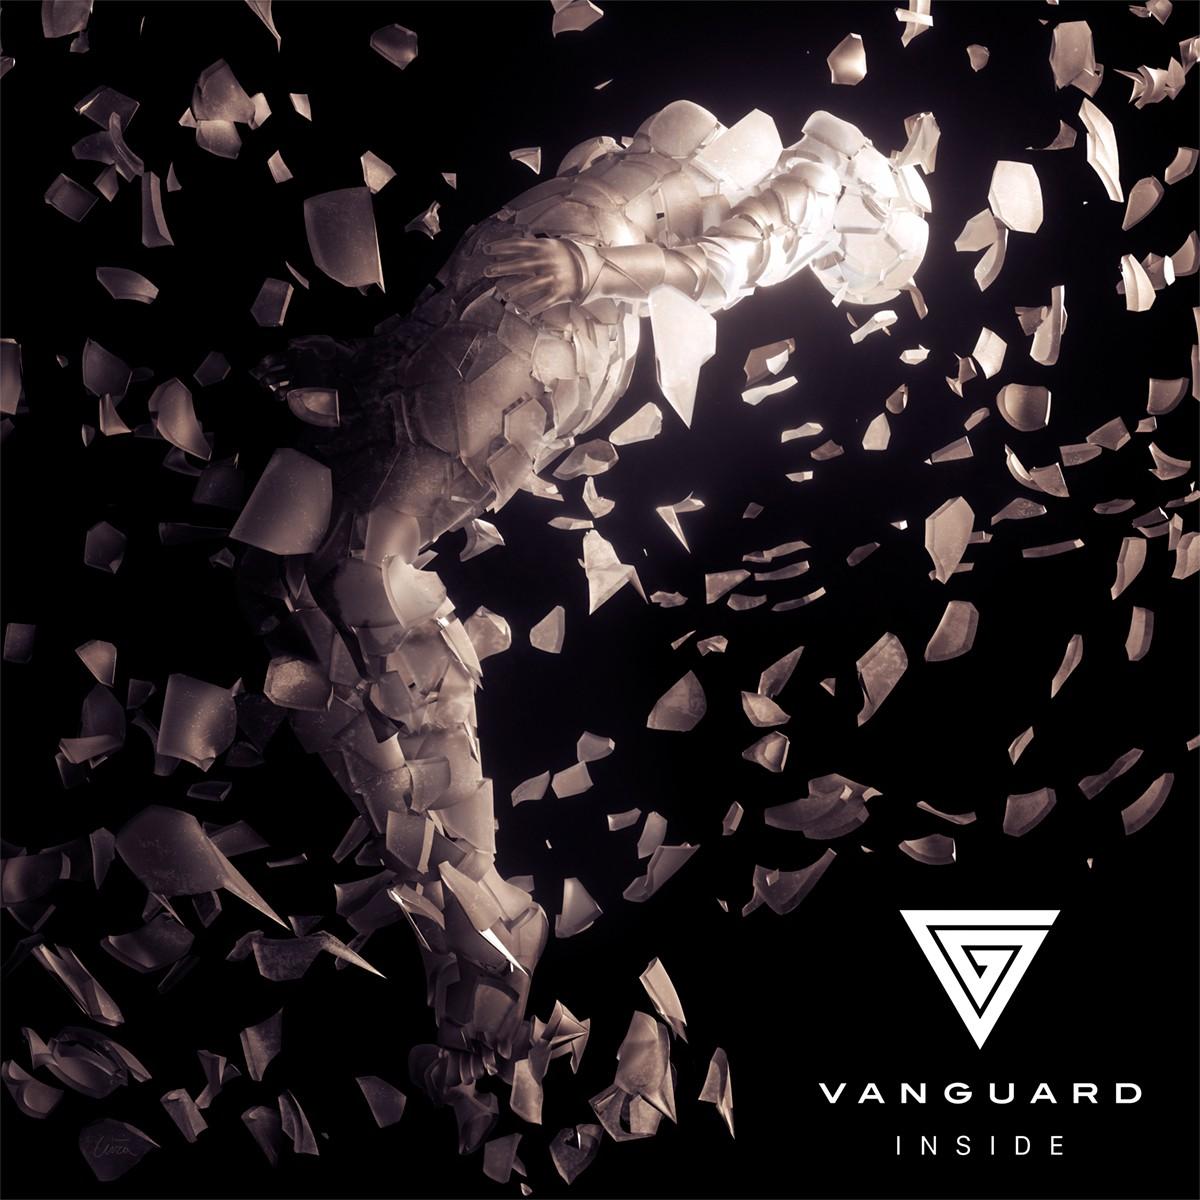 Digital single cover artwork